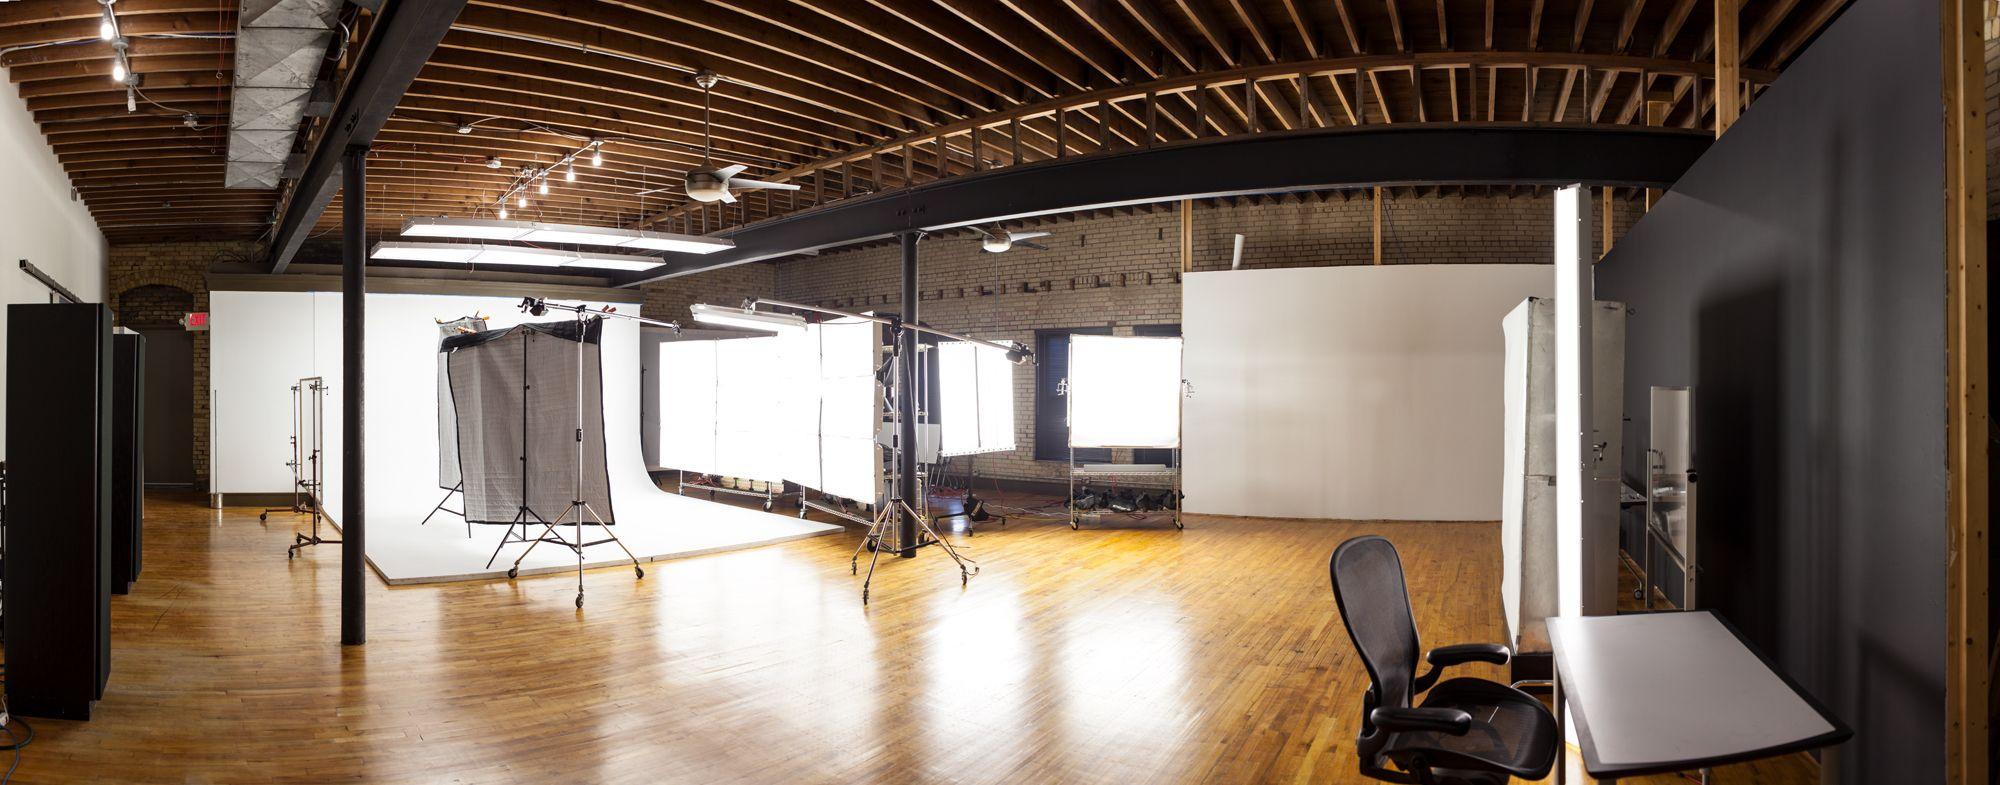 Studio cyc.jpg